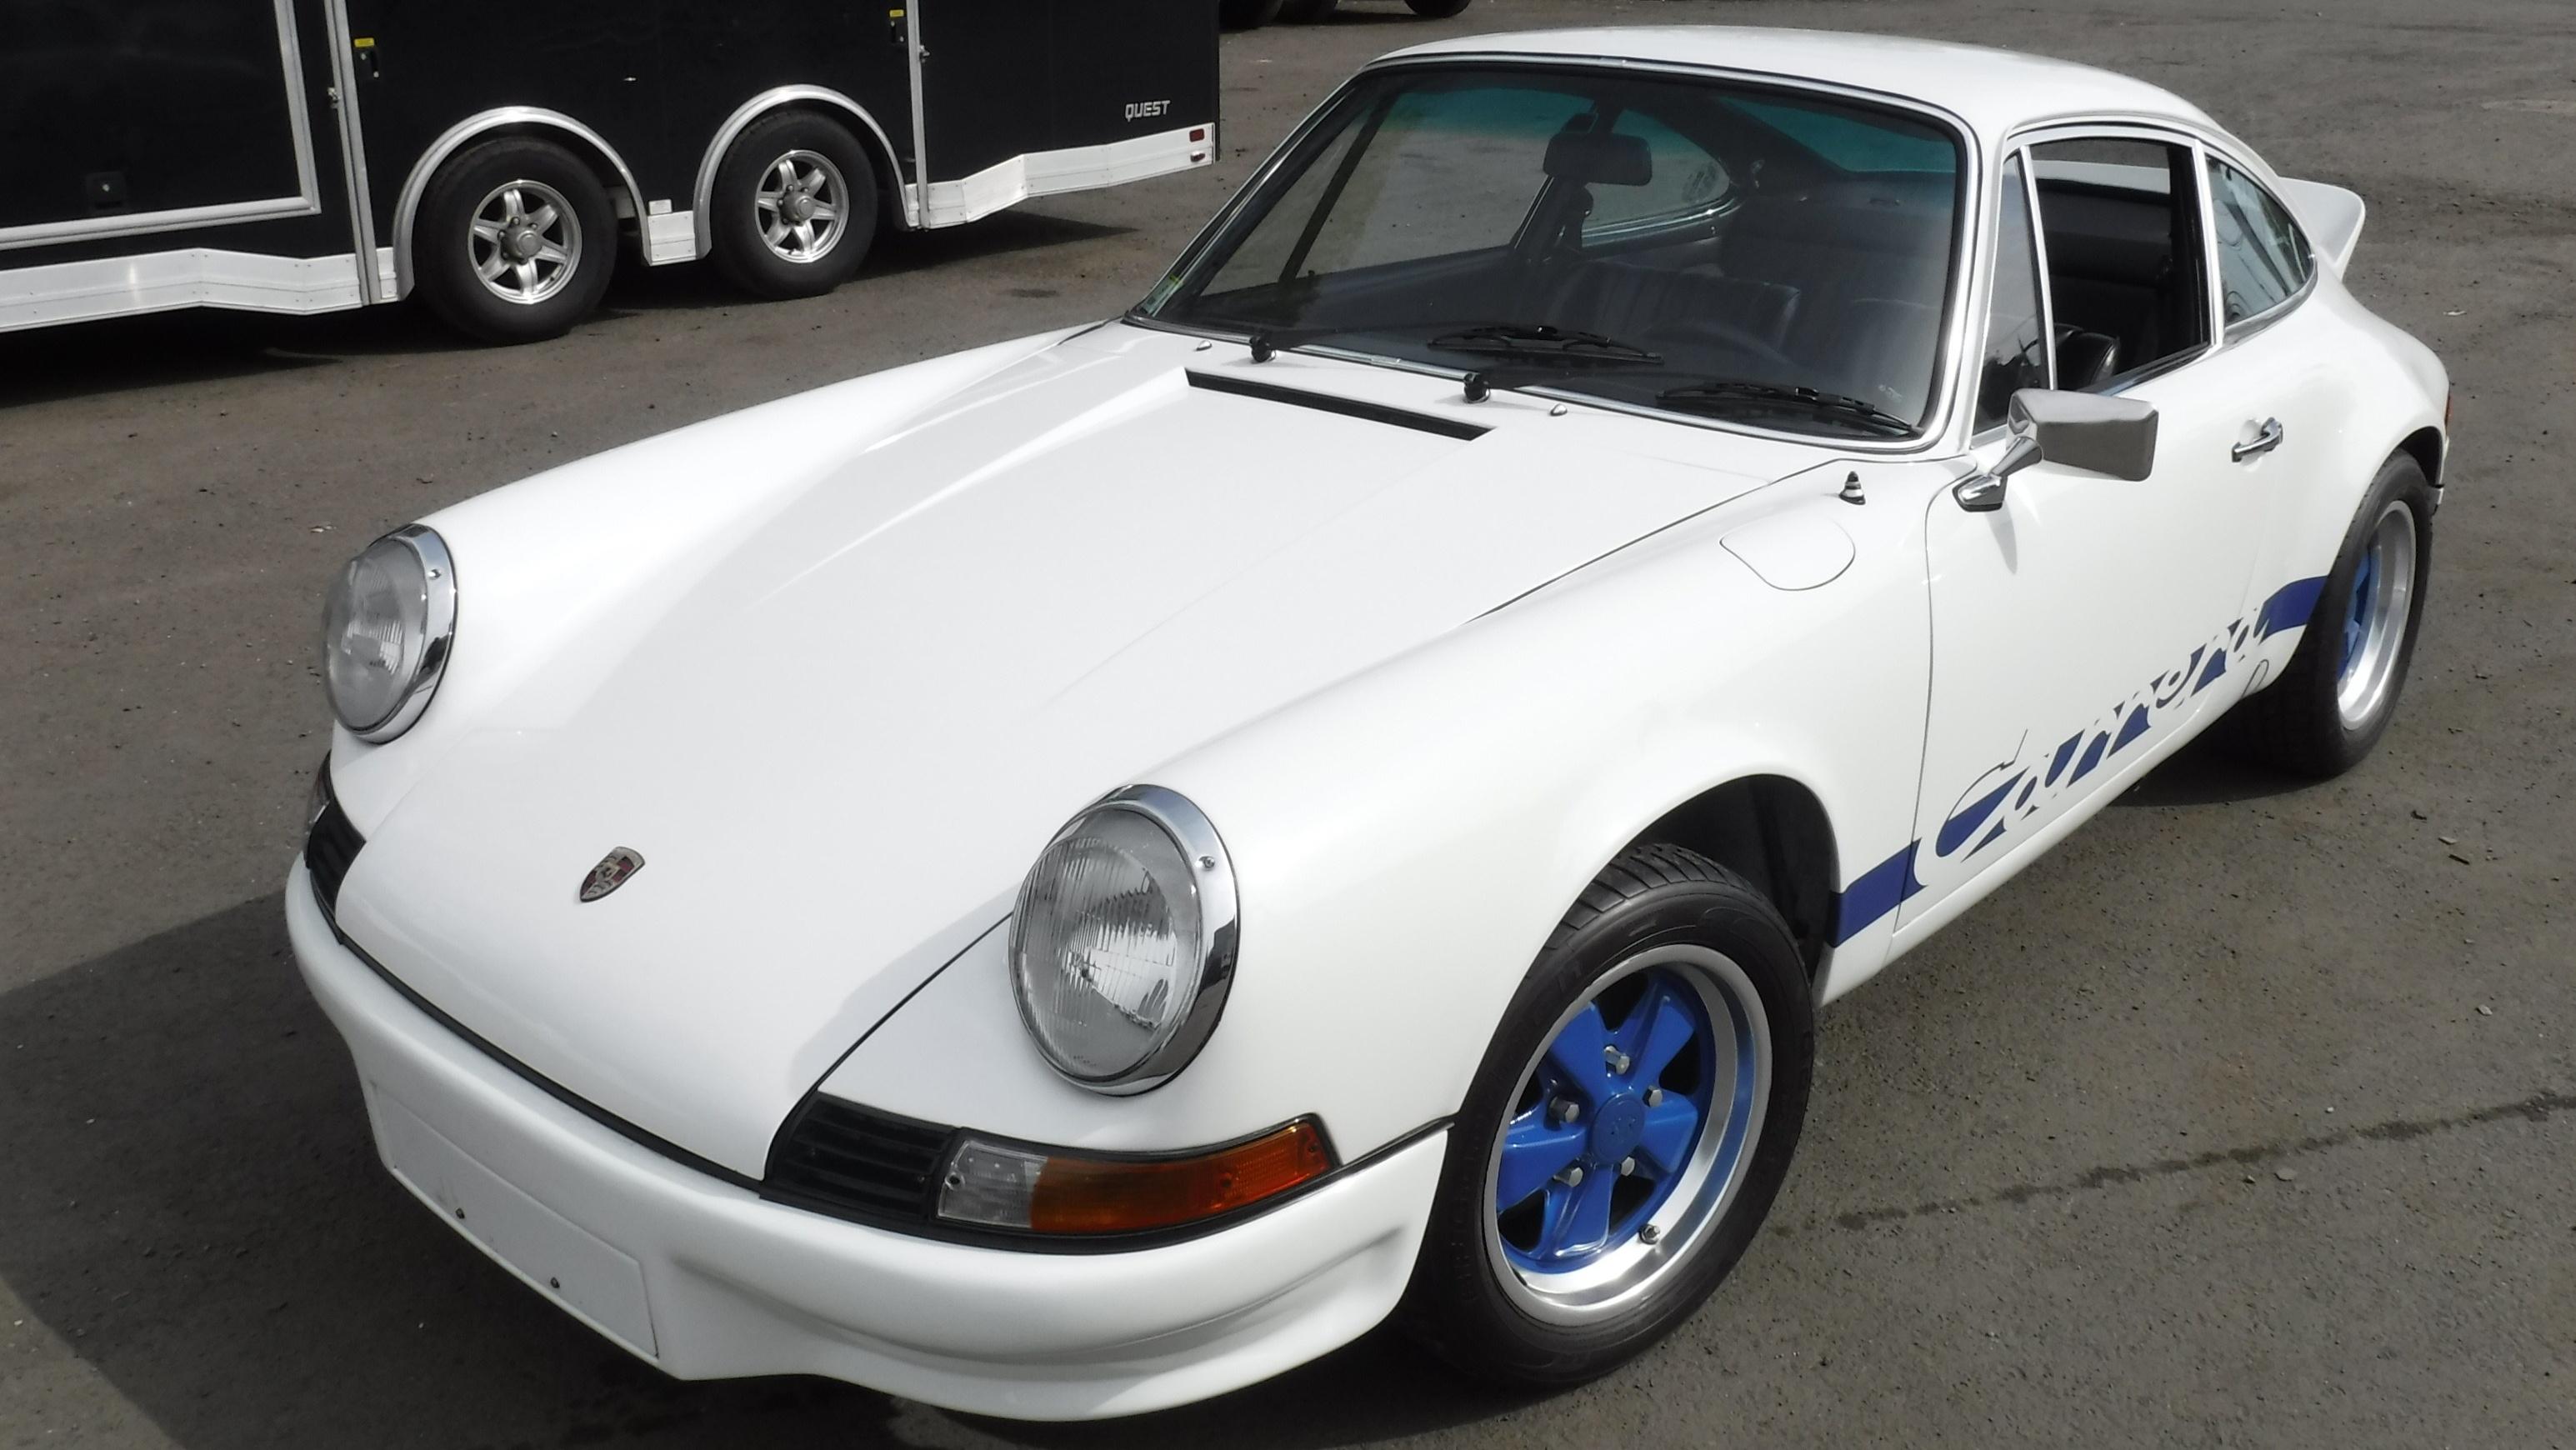 Porsche Carrera RS Being Shipped Overseas to Europe